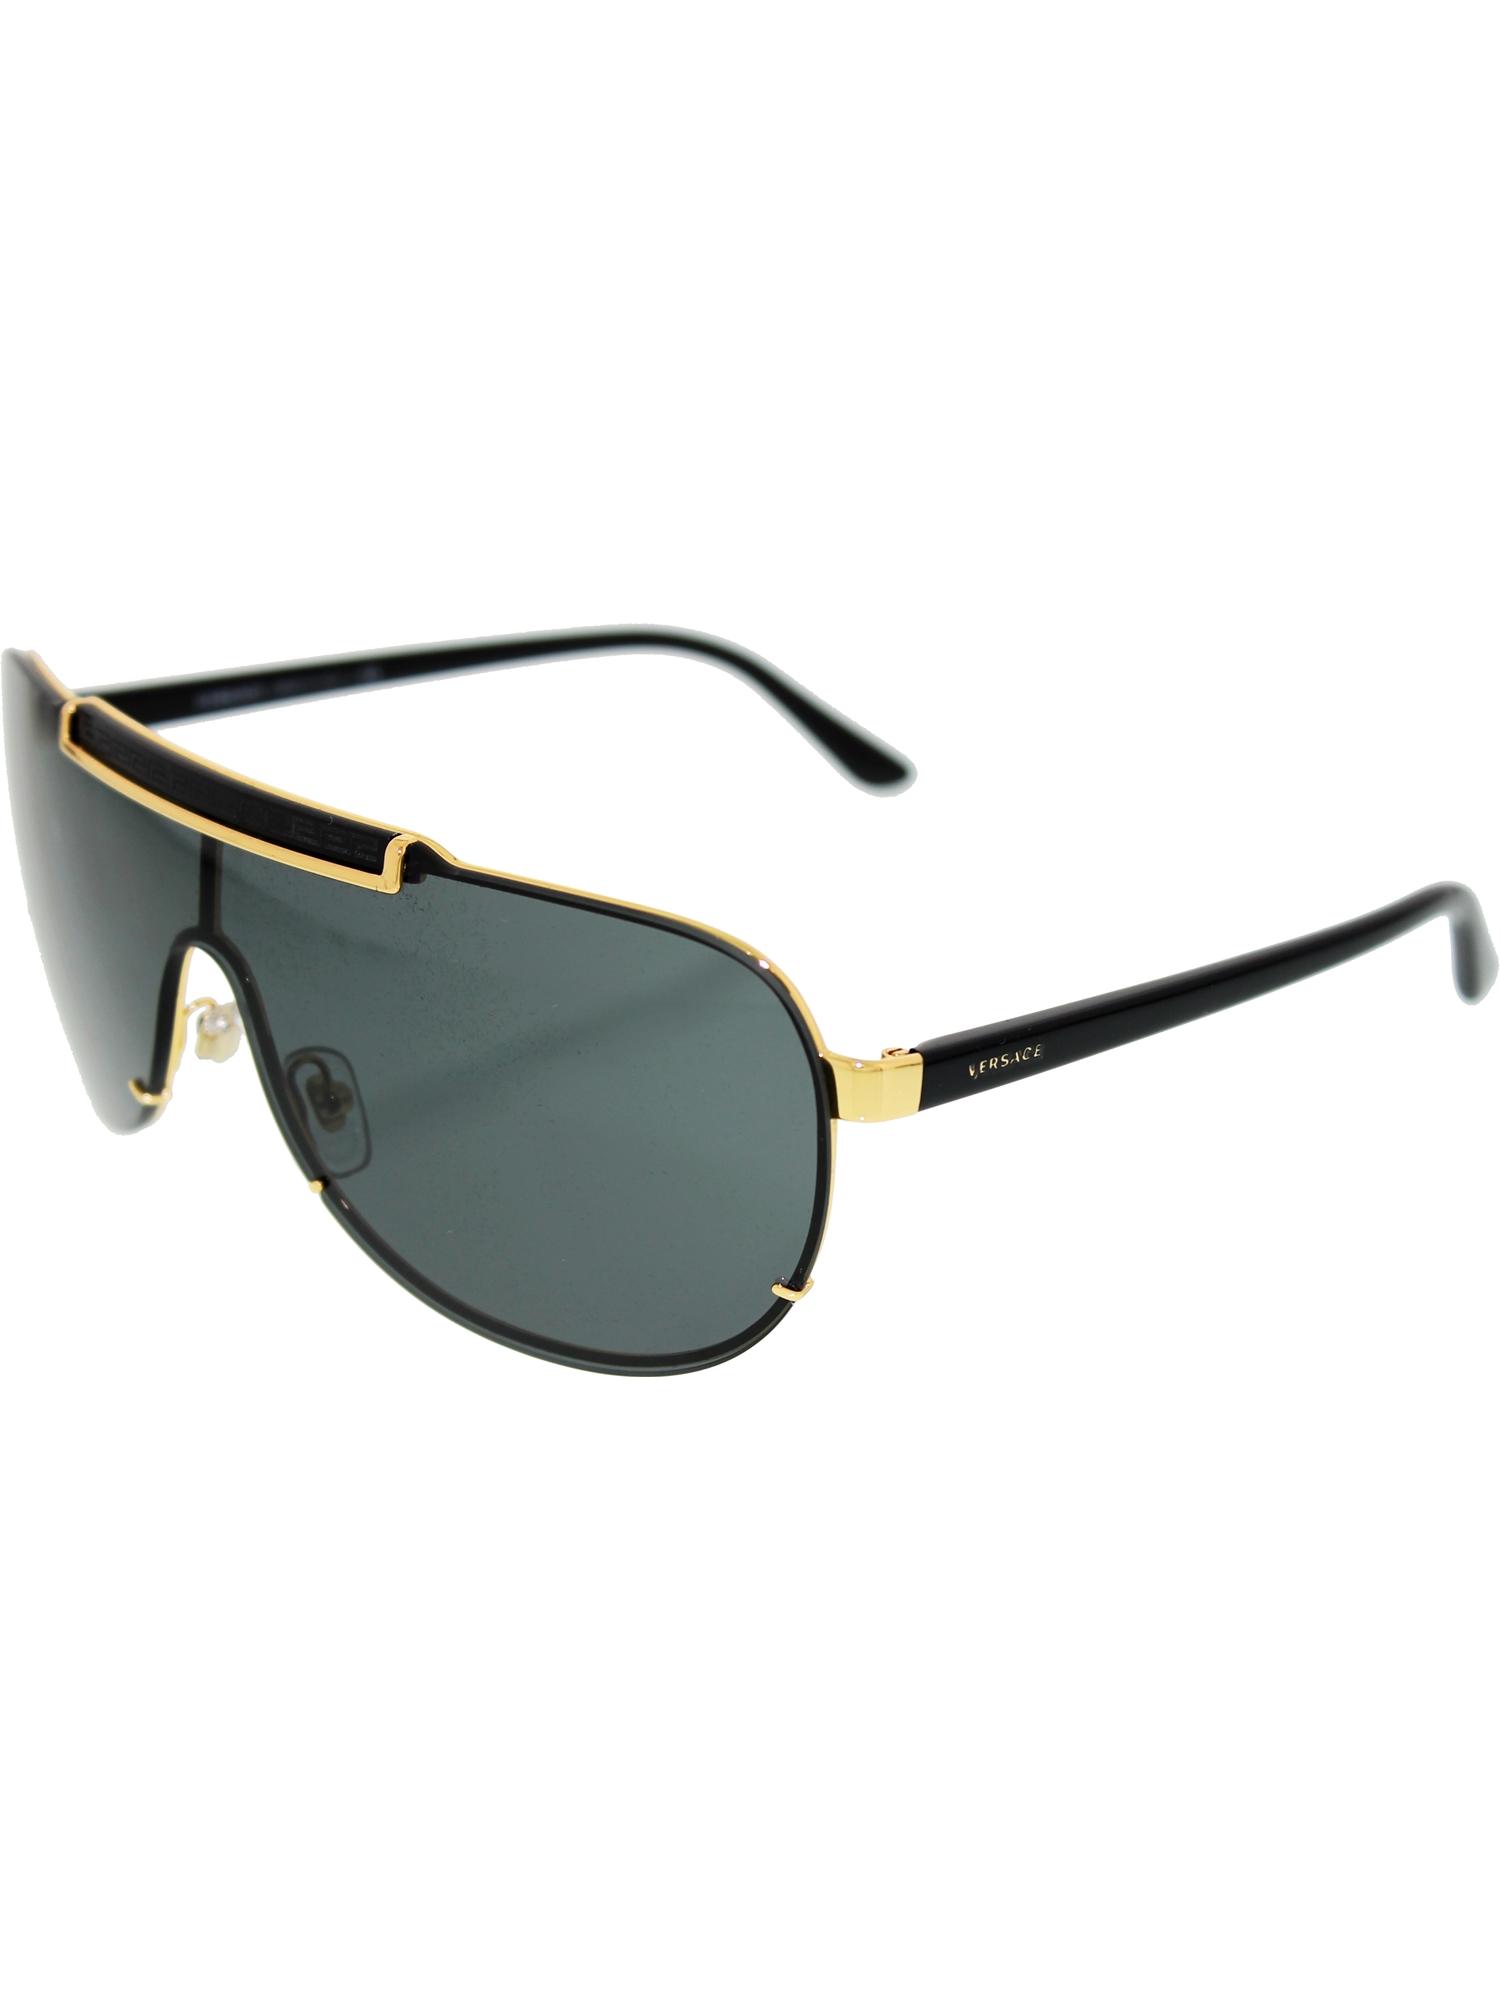 Versace Férfi Napszemüveg VE2140-100287-40 Gold Aviator - Glami.hu 7b4a630873